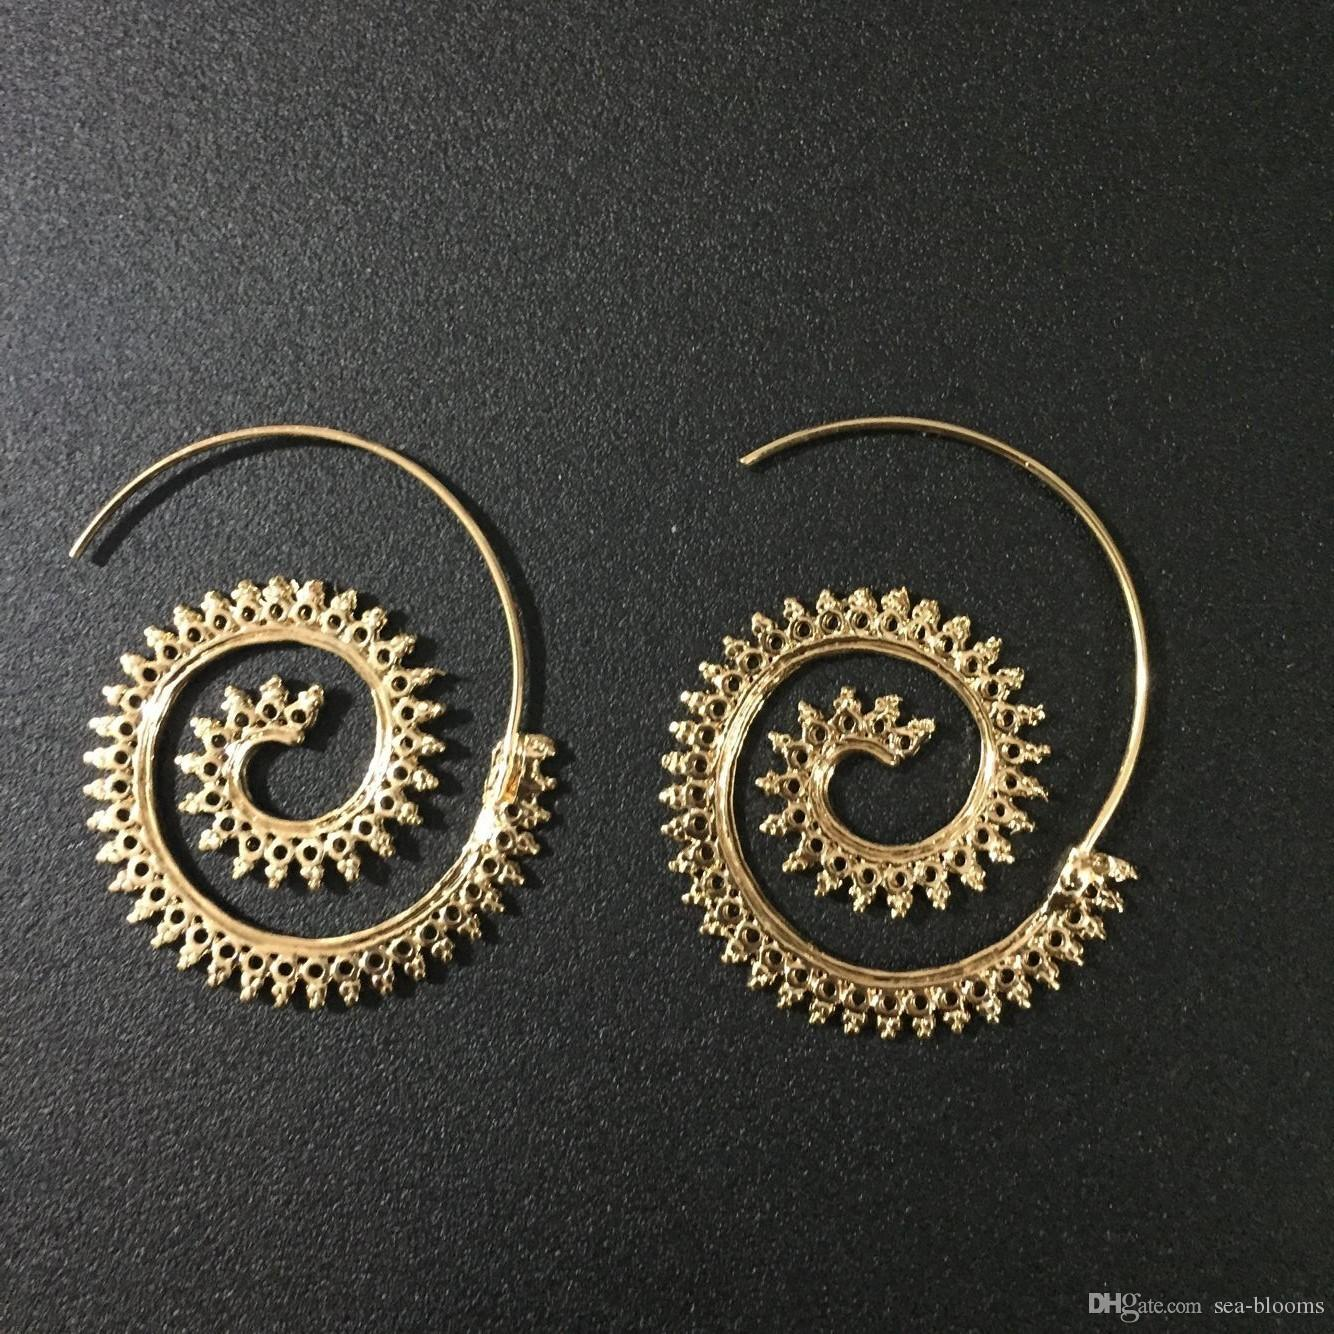 d37820030 2019 Vintage Boho Style Women Circles Round Spiral Tribal Hoop Earrings  Retro Jewelry Fashion Hollow Swirl Hoop Indian Bohemian Earrings D93S From  Sea ...